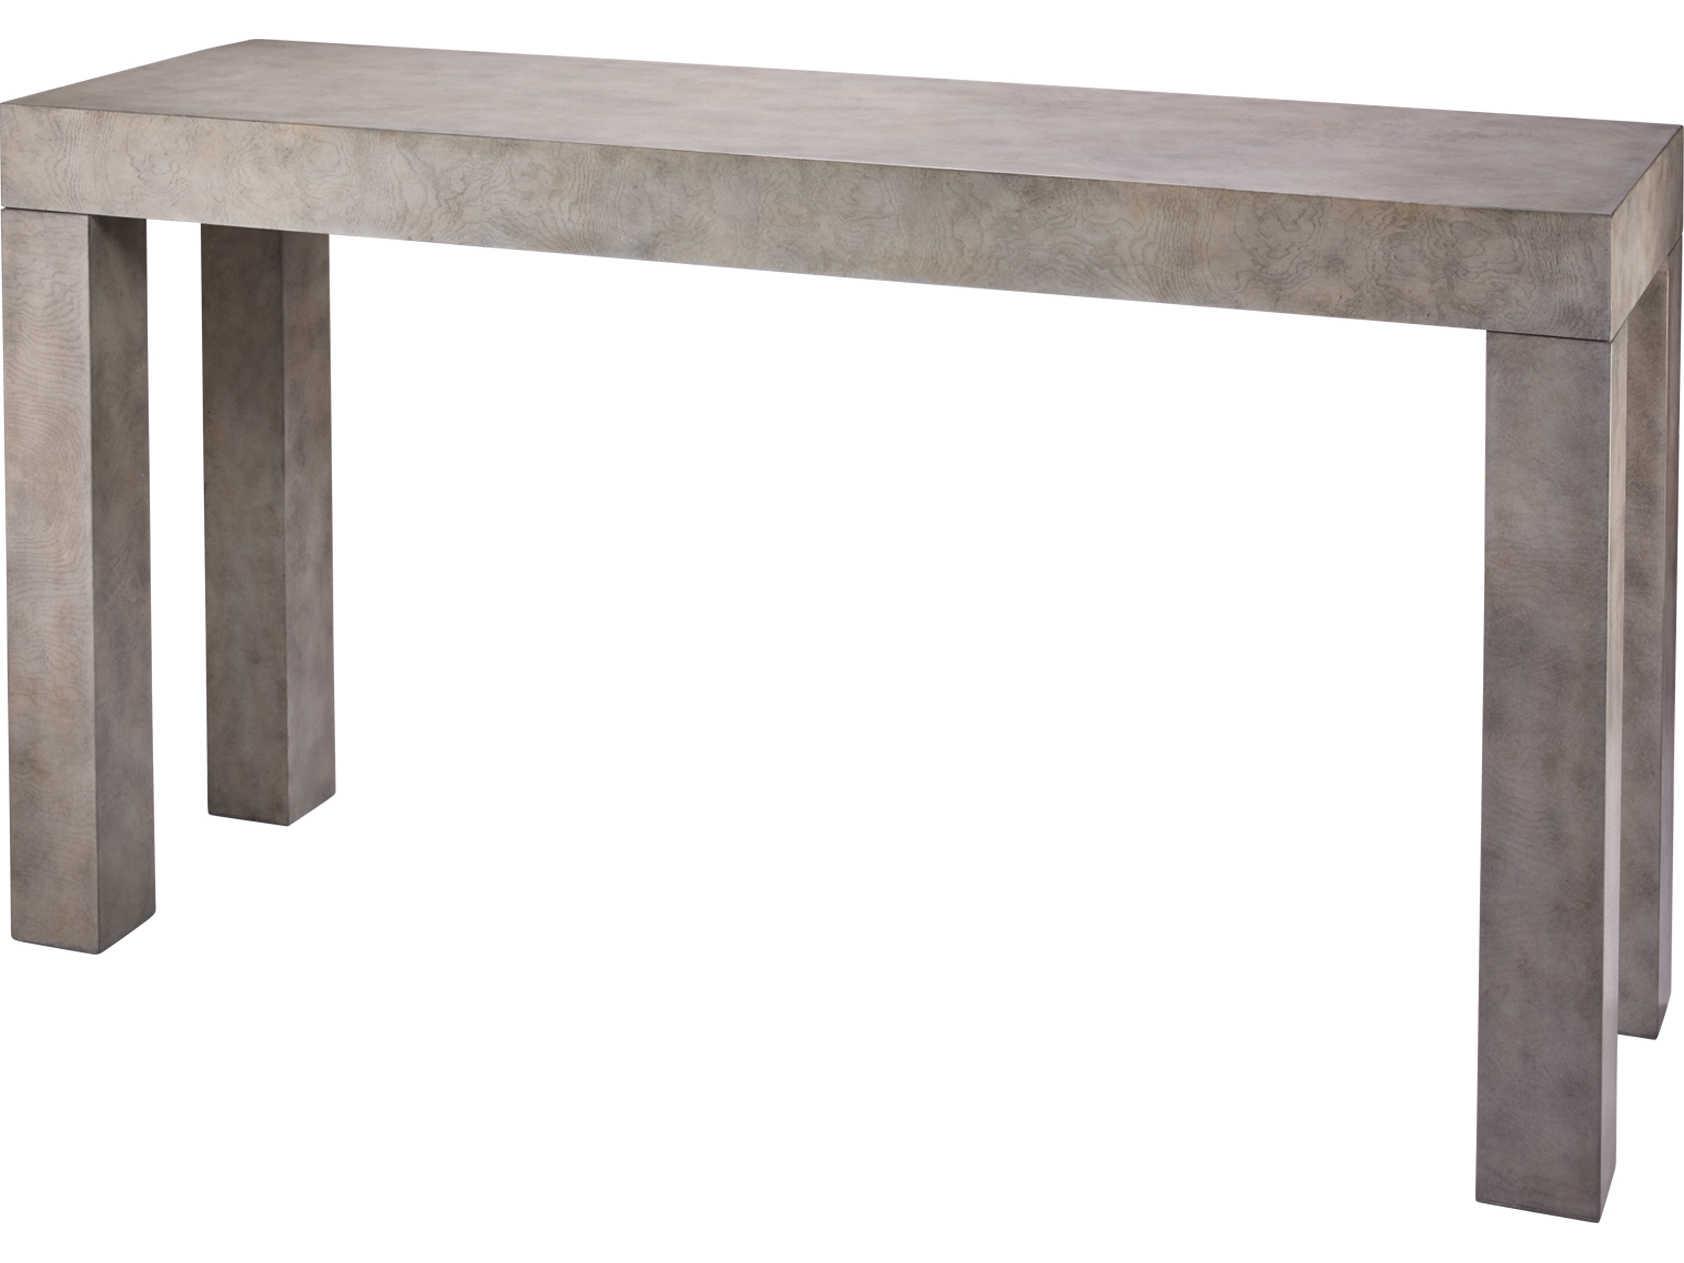 Jamie Young Company Grey Burl Wood Veneer 60 Wide Rectangular Console Table